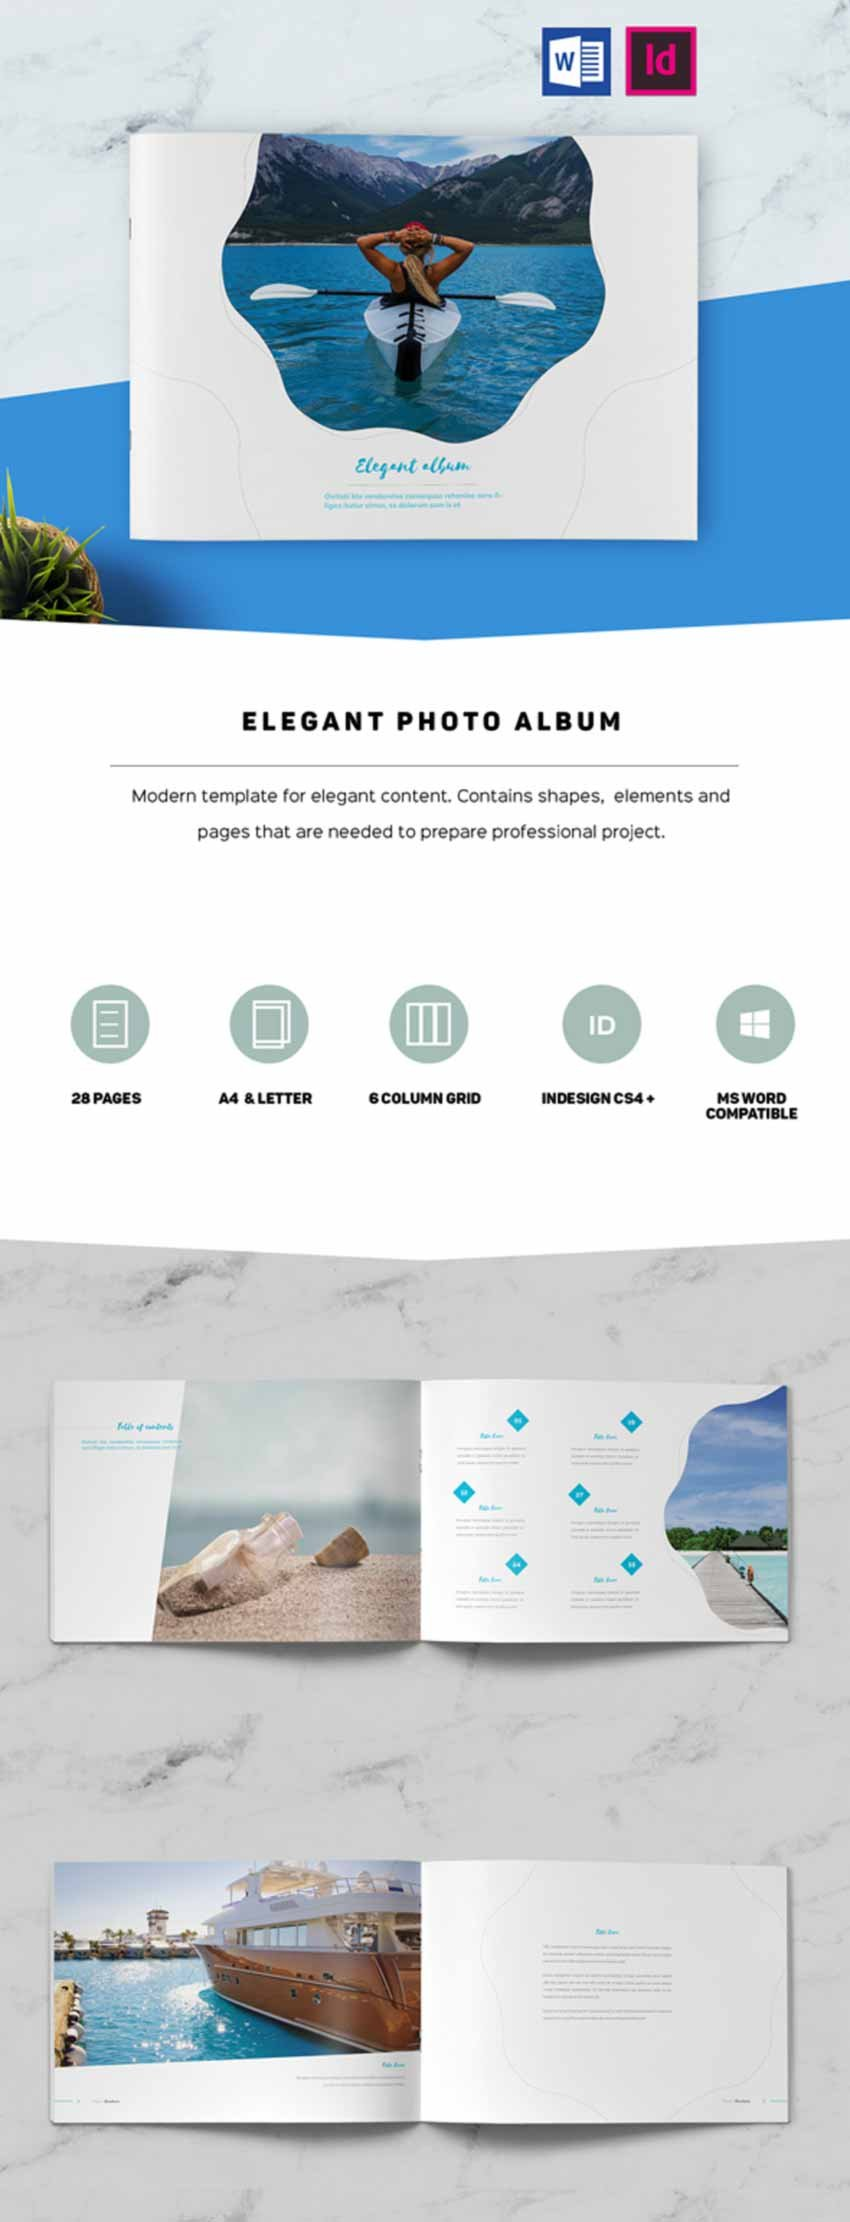 Stylish Photobook Template Design